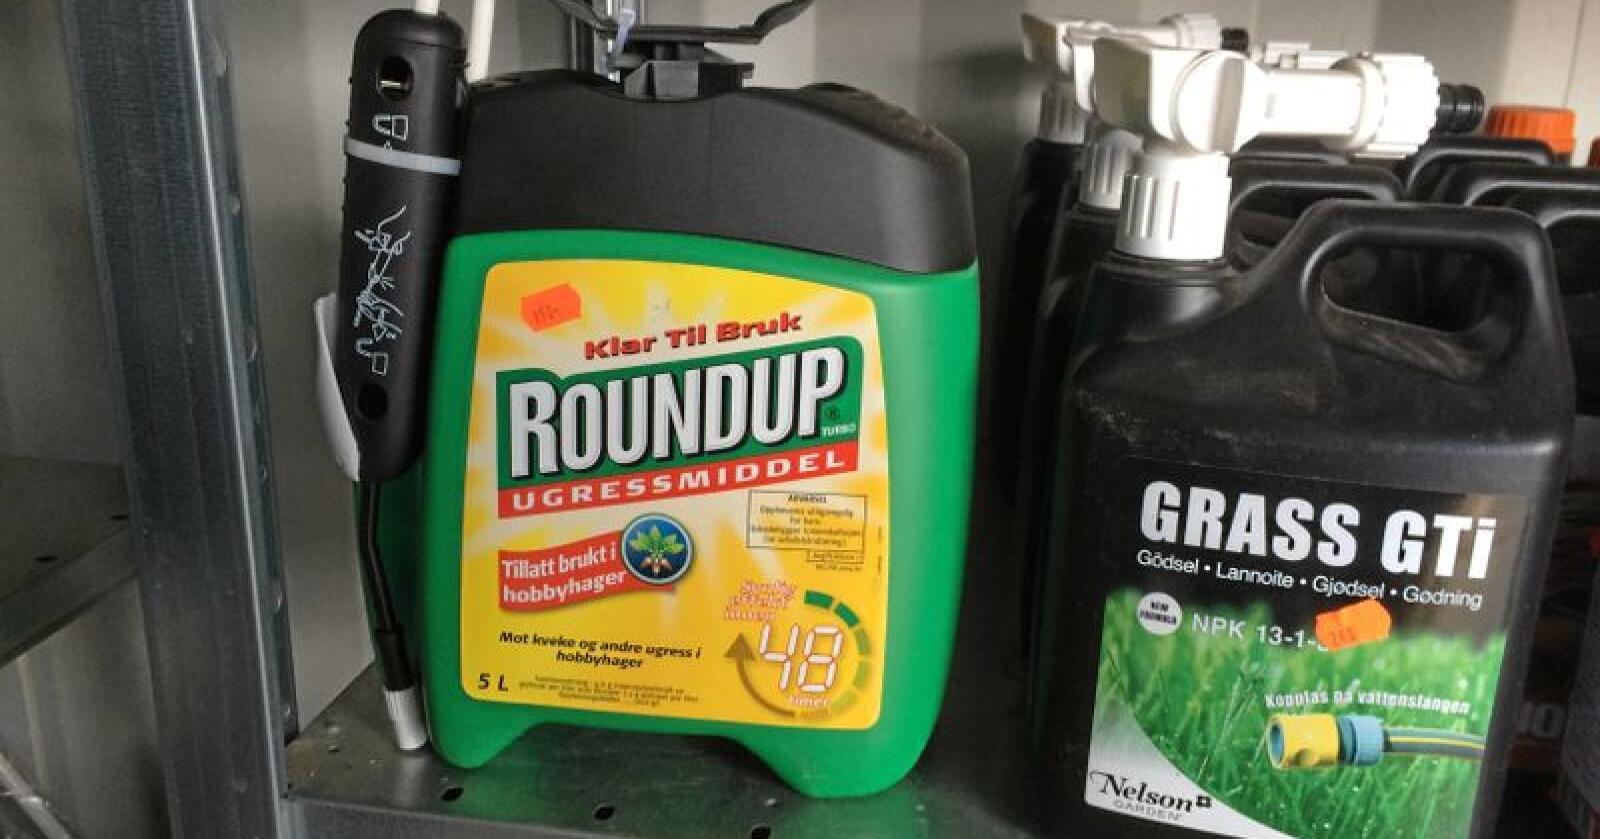 Selskapet Bayer eleverer flere former for ugressmiddel, blant annet Roundup. Foto: Svein Egil Hatlevik